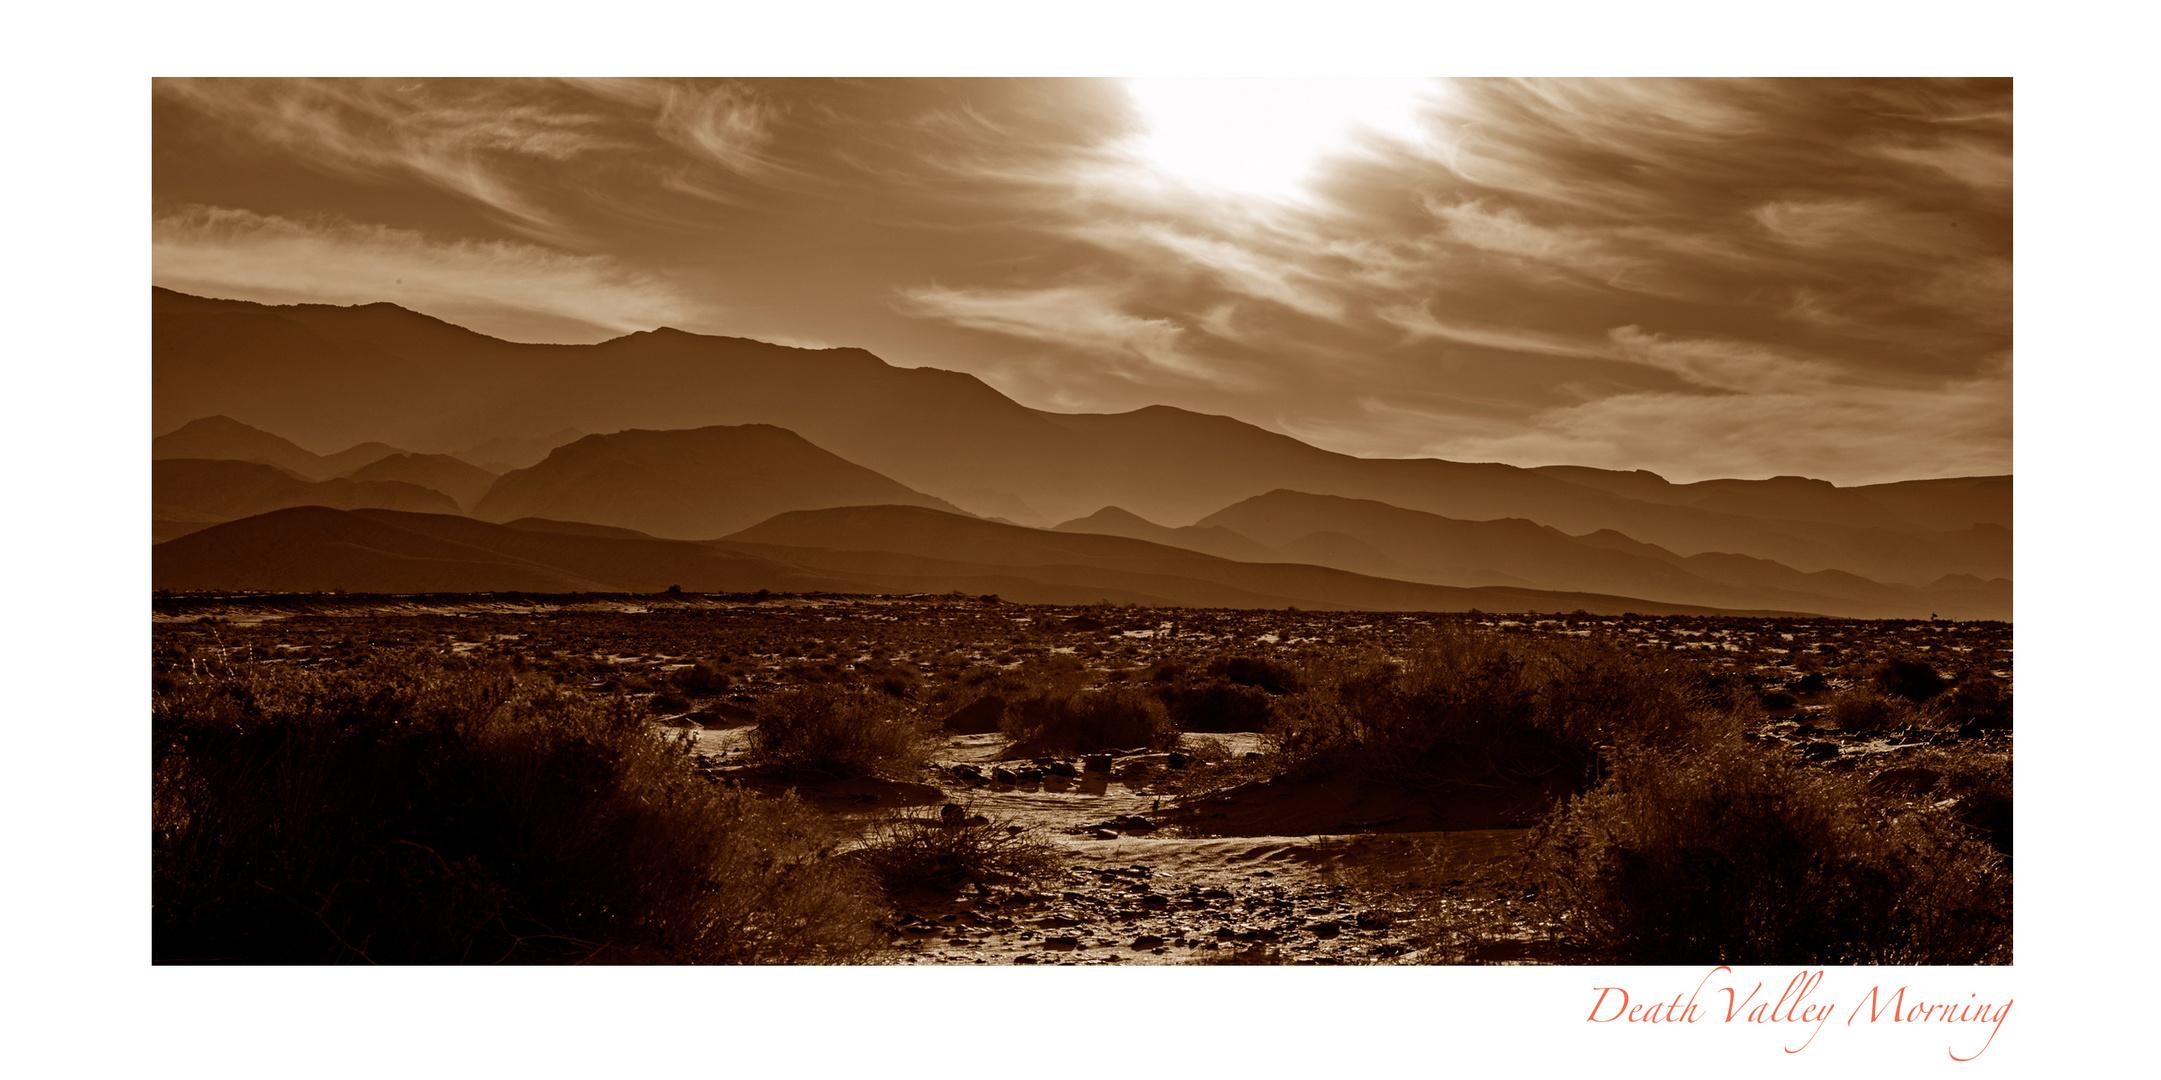 Death Valley Morning